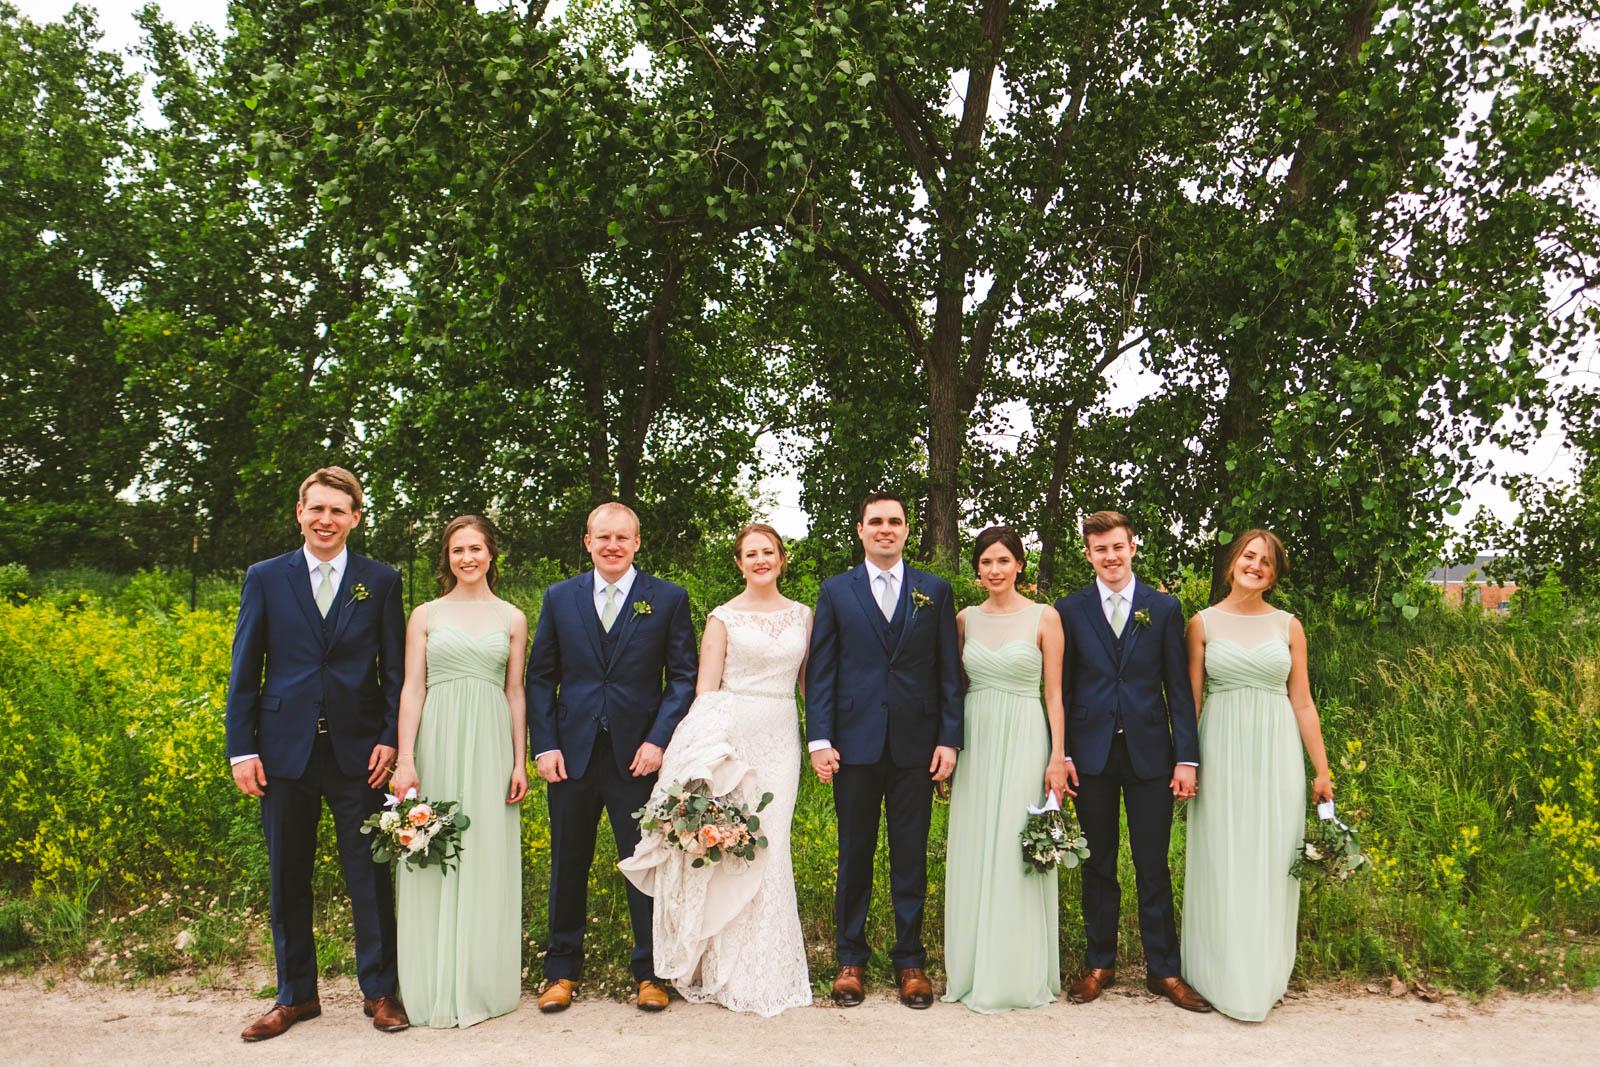 Toledo Wedding Photographers Capture Bridal Party for Creative Pictures in Toledo Ohio